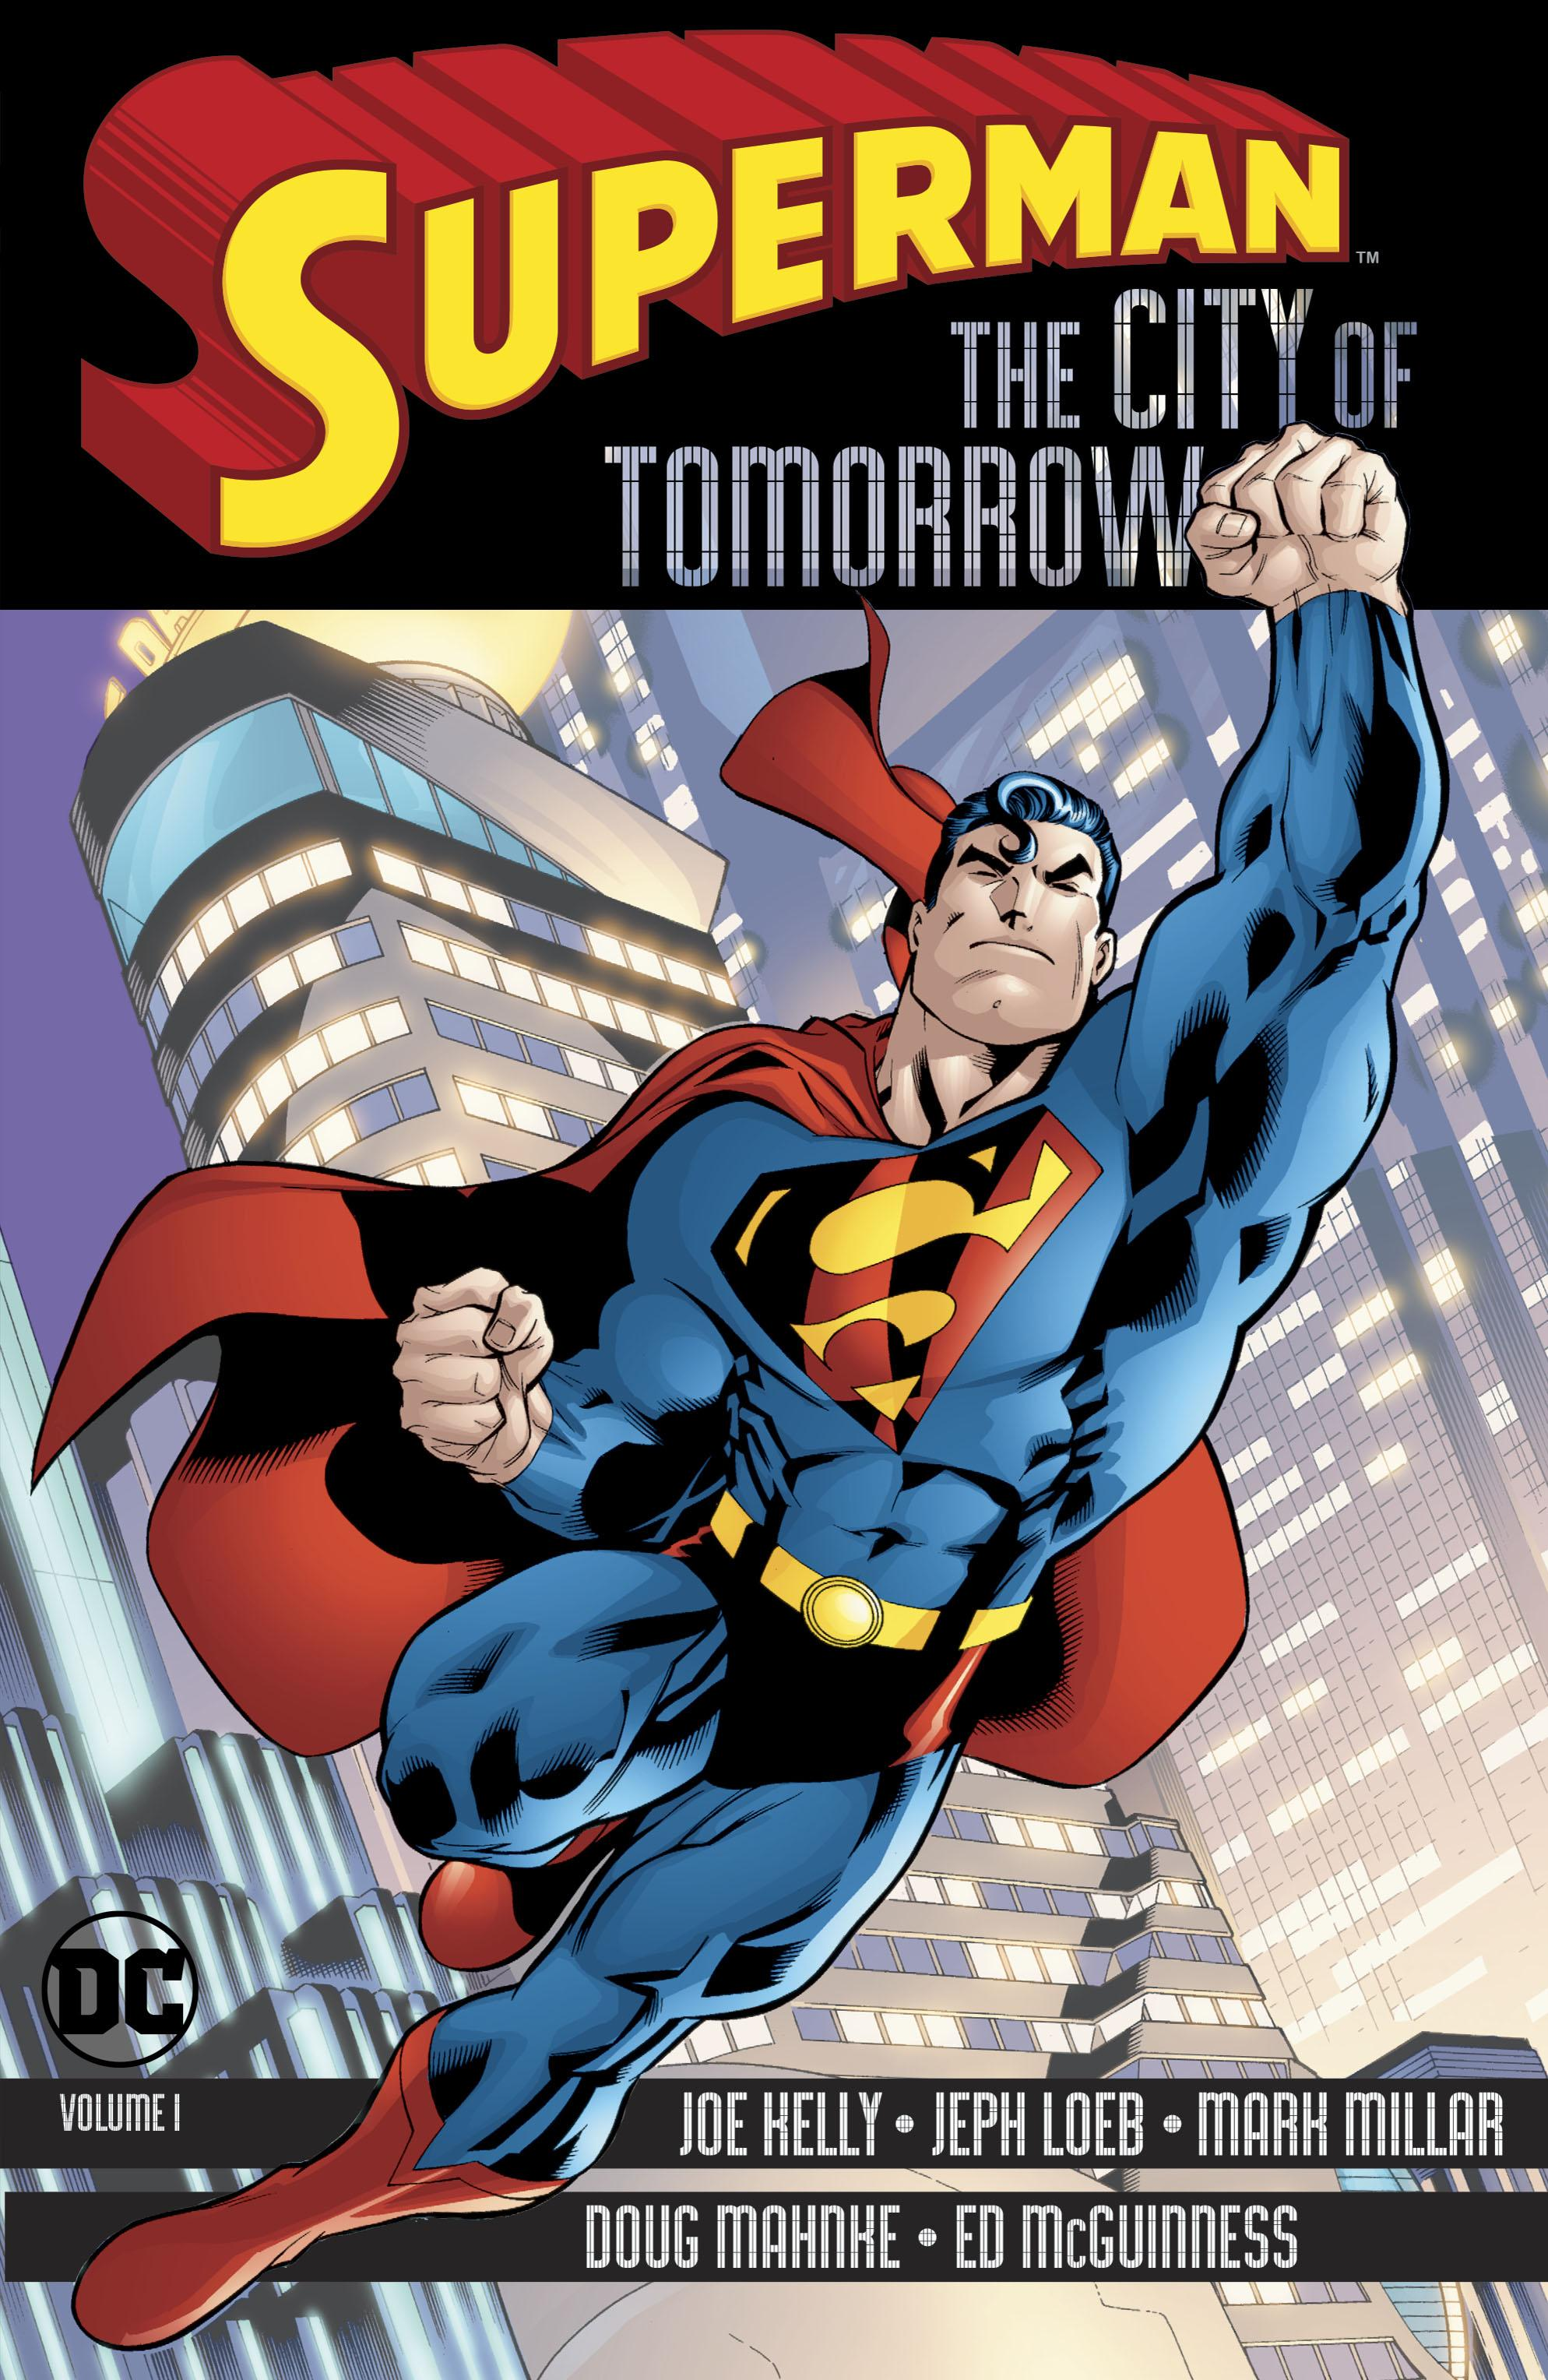 Superman The City of Tomorrow v01, 2019 12 11 TPB digital Glorith HD